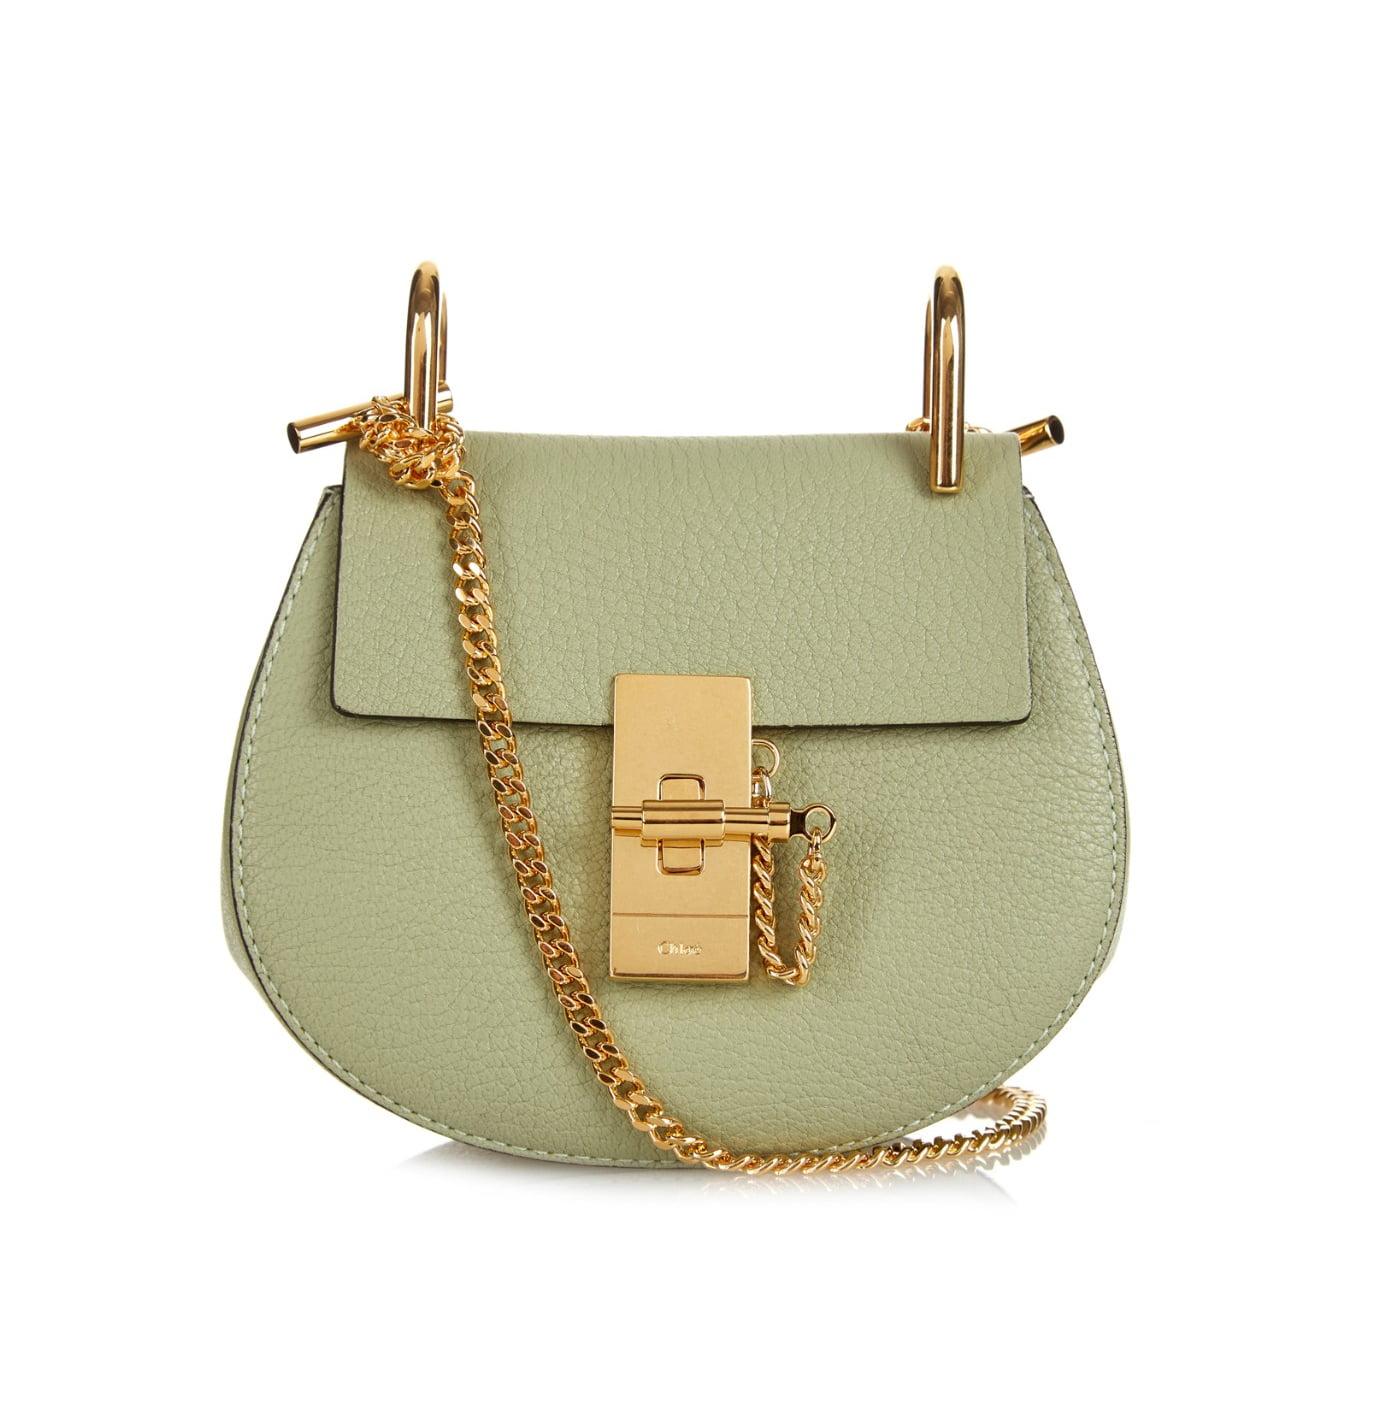 chloe-light-green-drew-nano-leather-cross-body-bag-green-product-0-295065278-normal